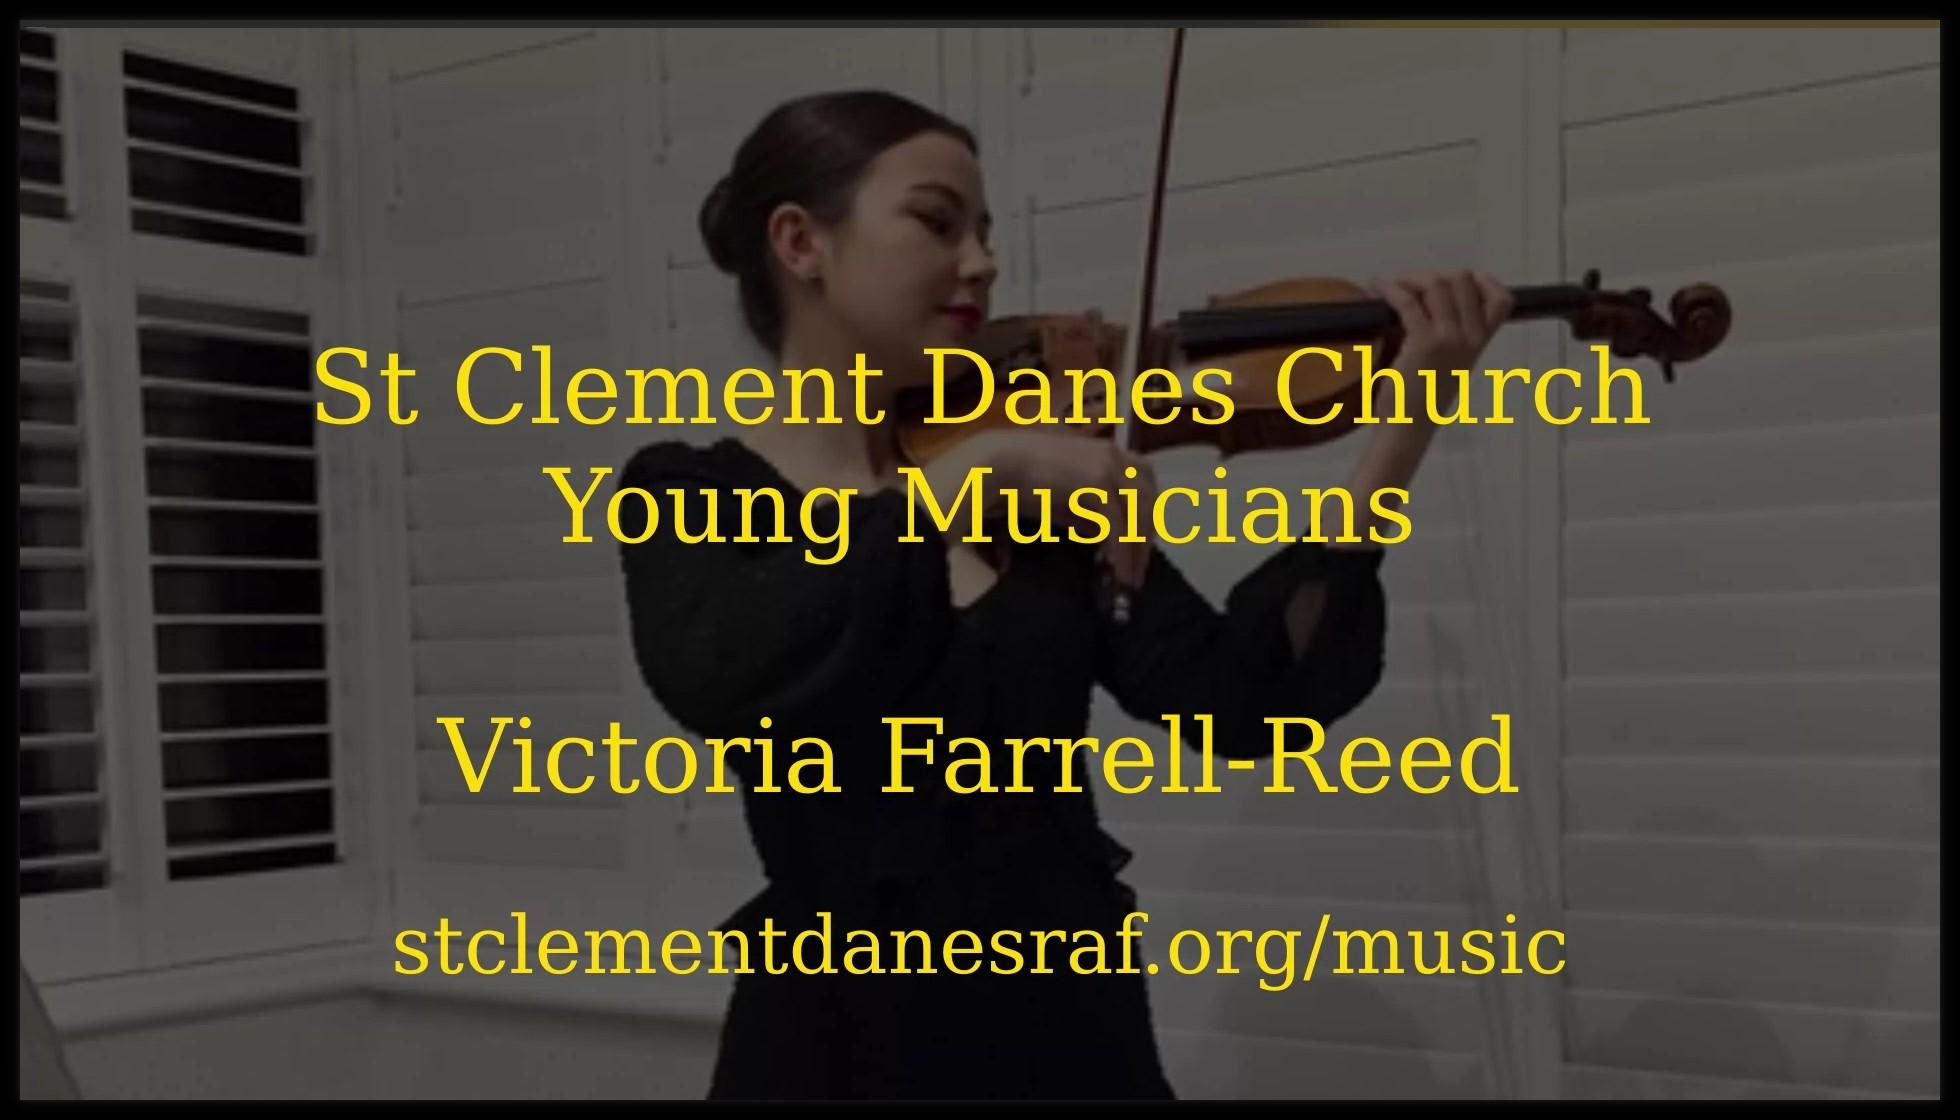 Victoria Farrell-Reed